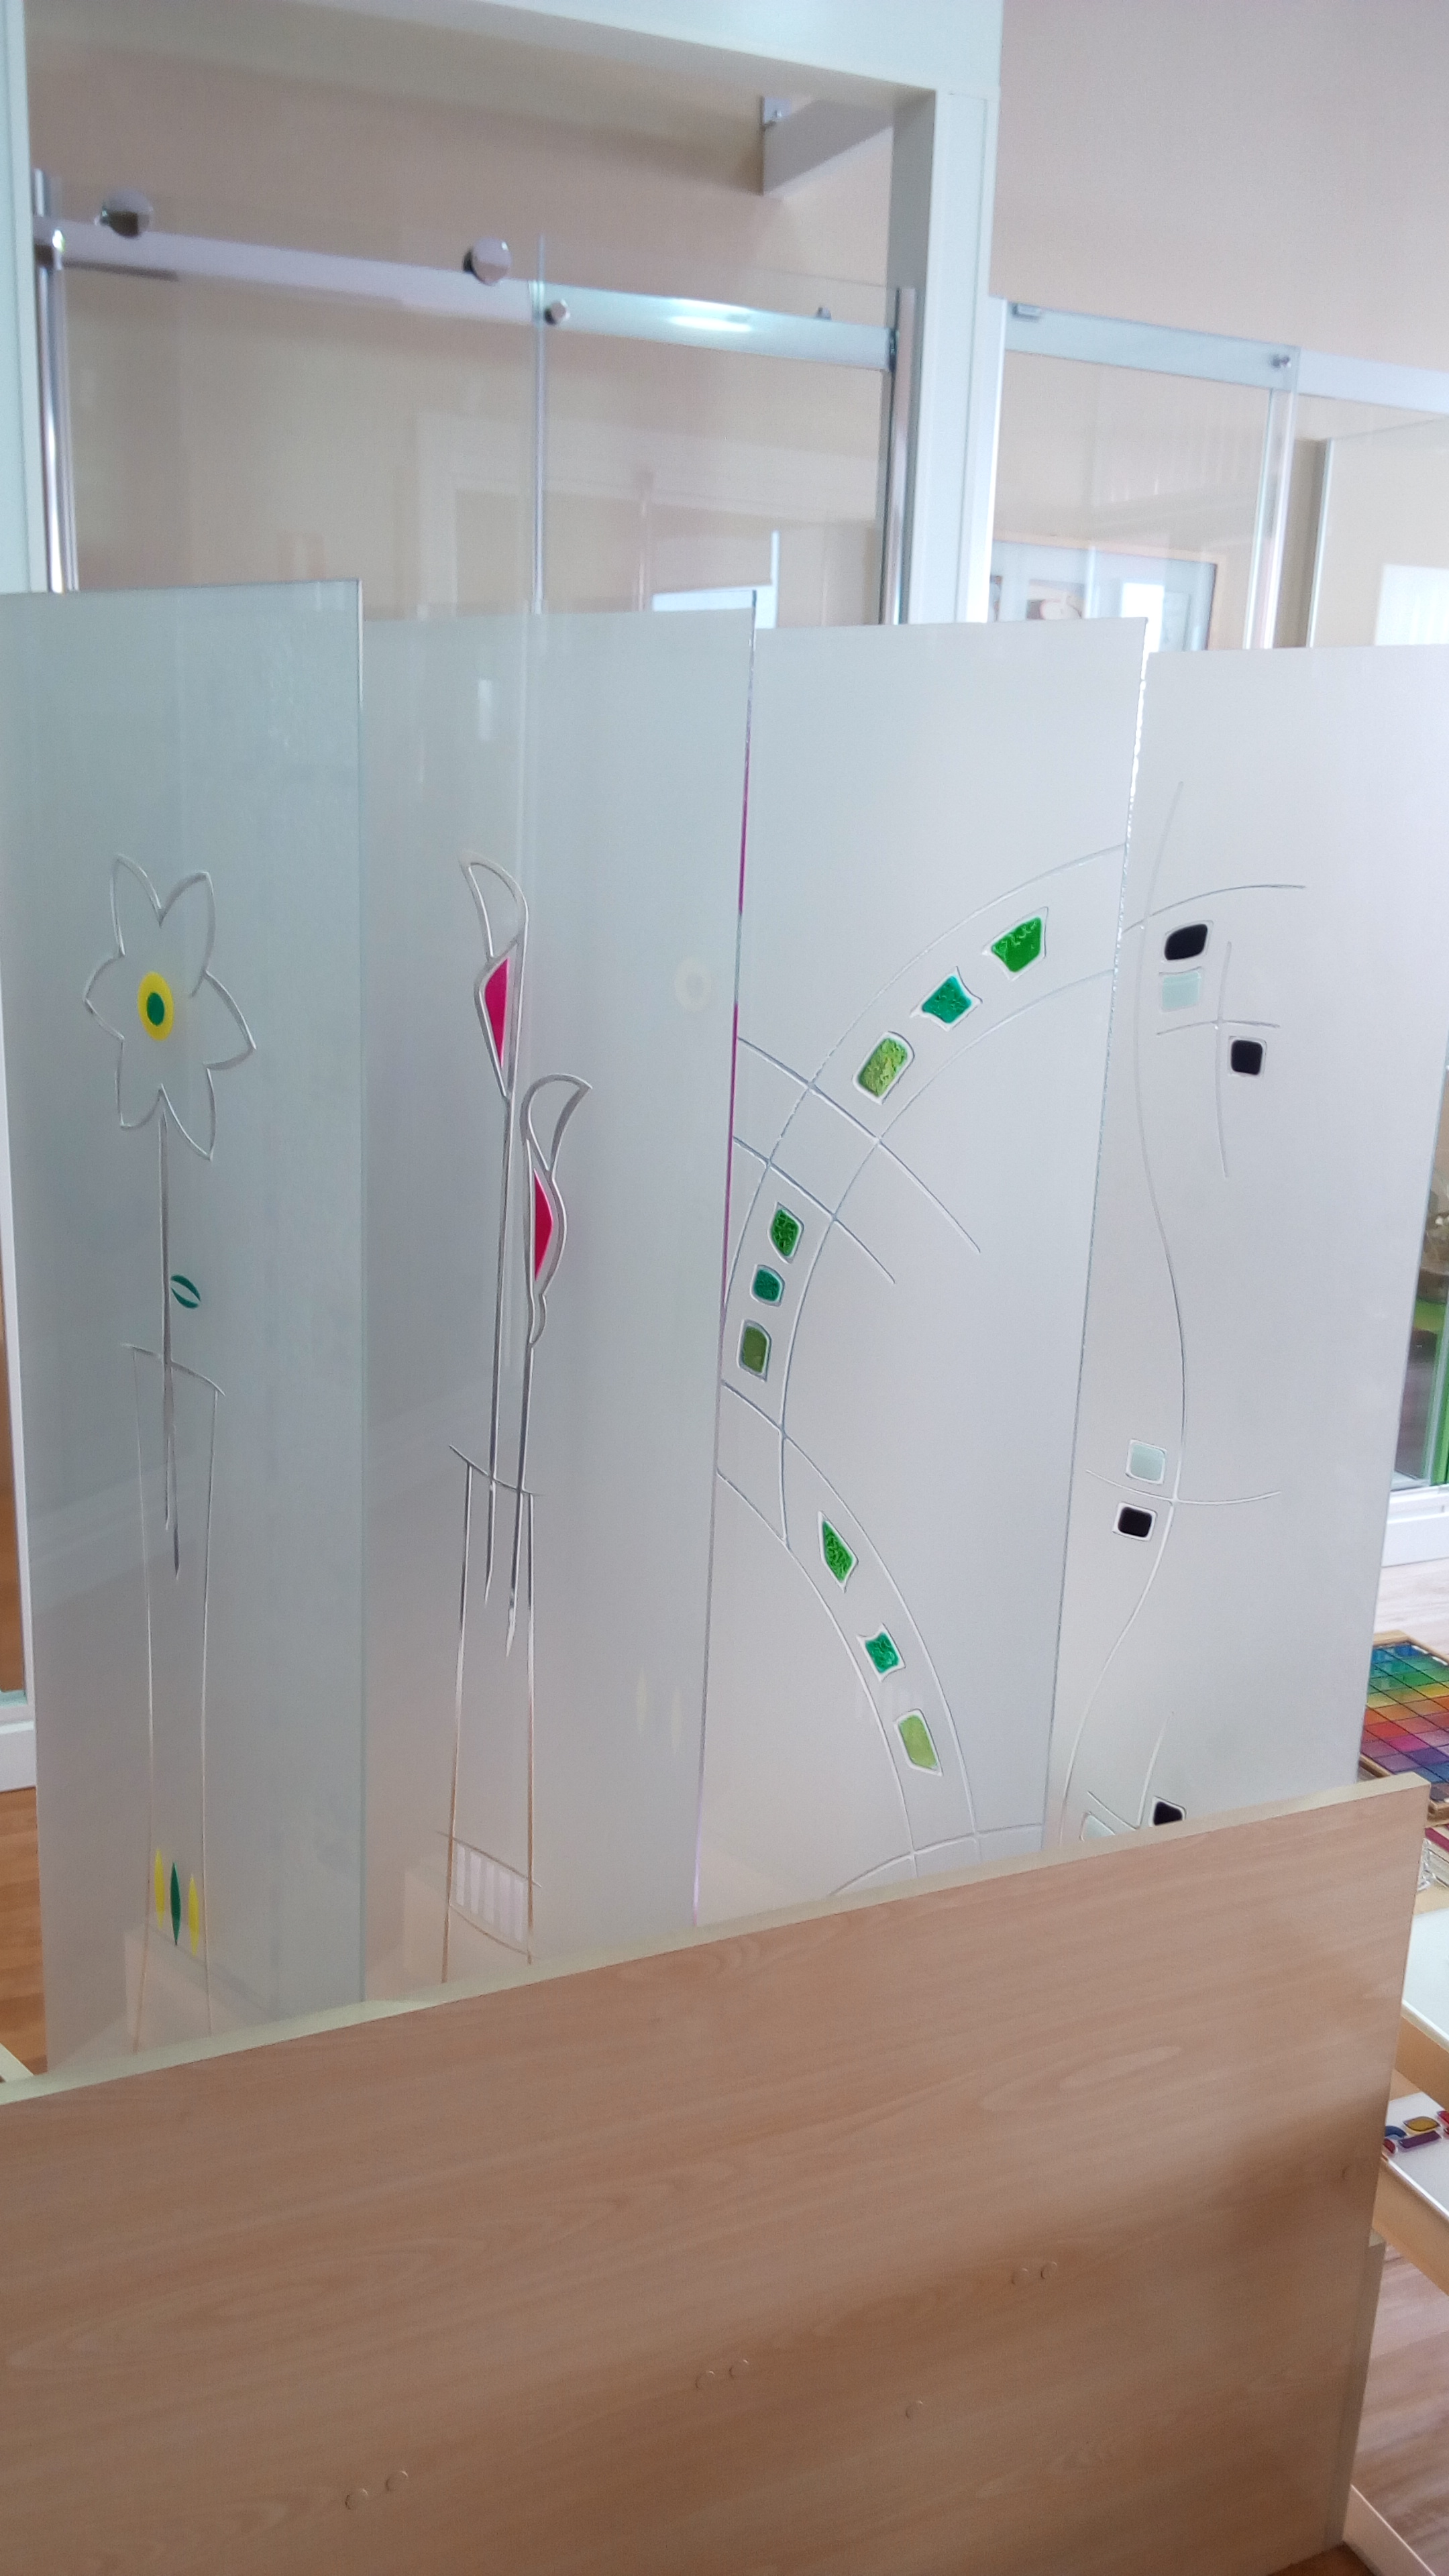 Cristales para puertas aluminios villalba empresa de - Cristales decorados para puertas ...